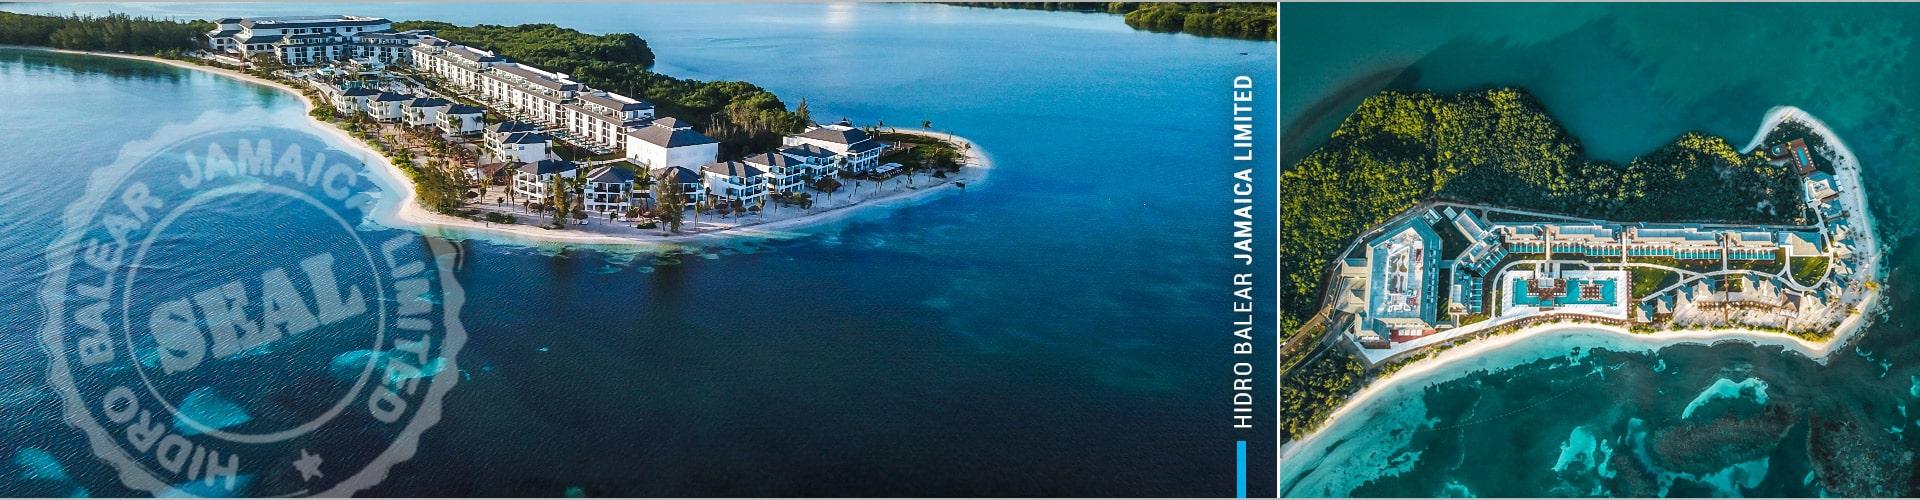 Excellence Oyster Bay, Jamaica | Hidro Balear